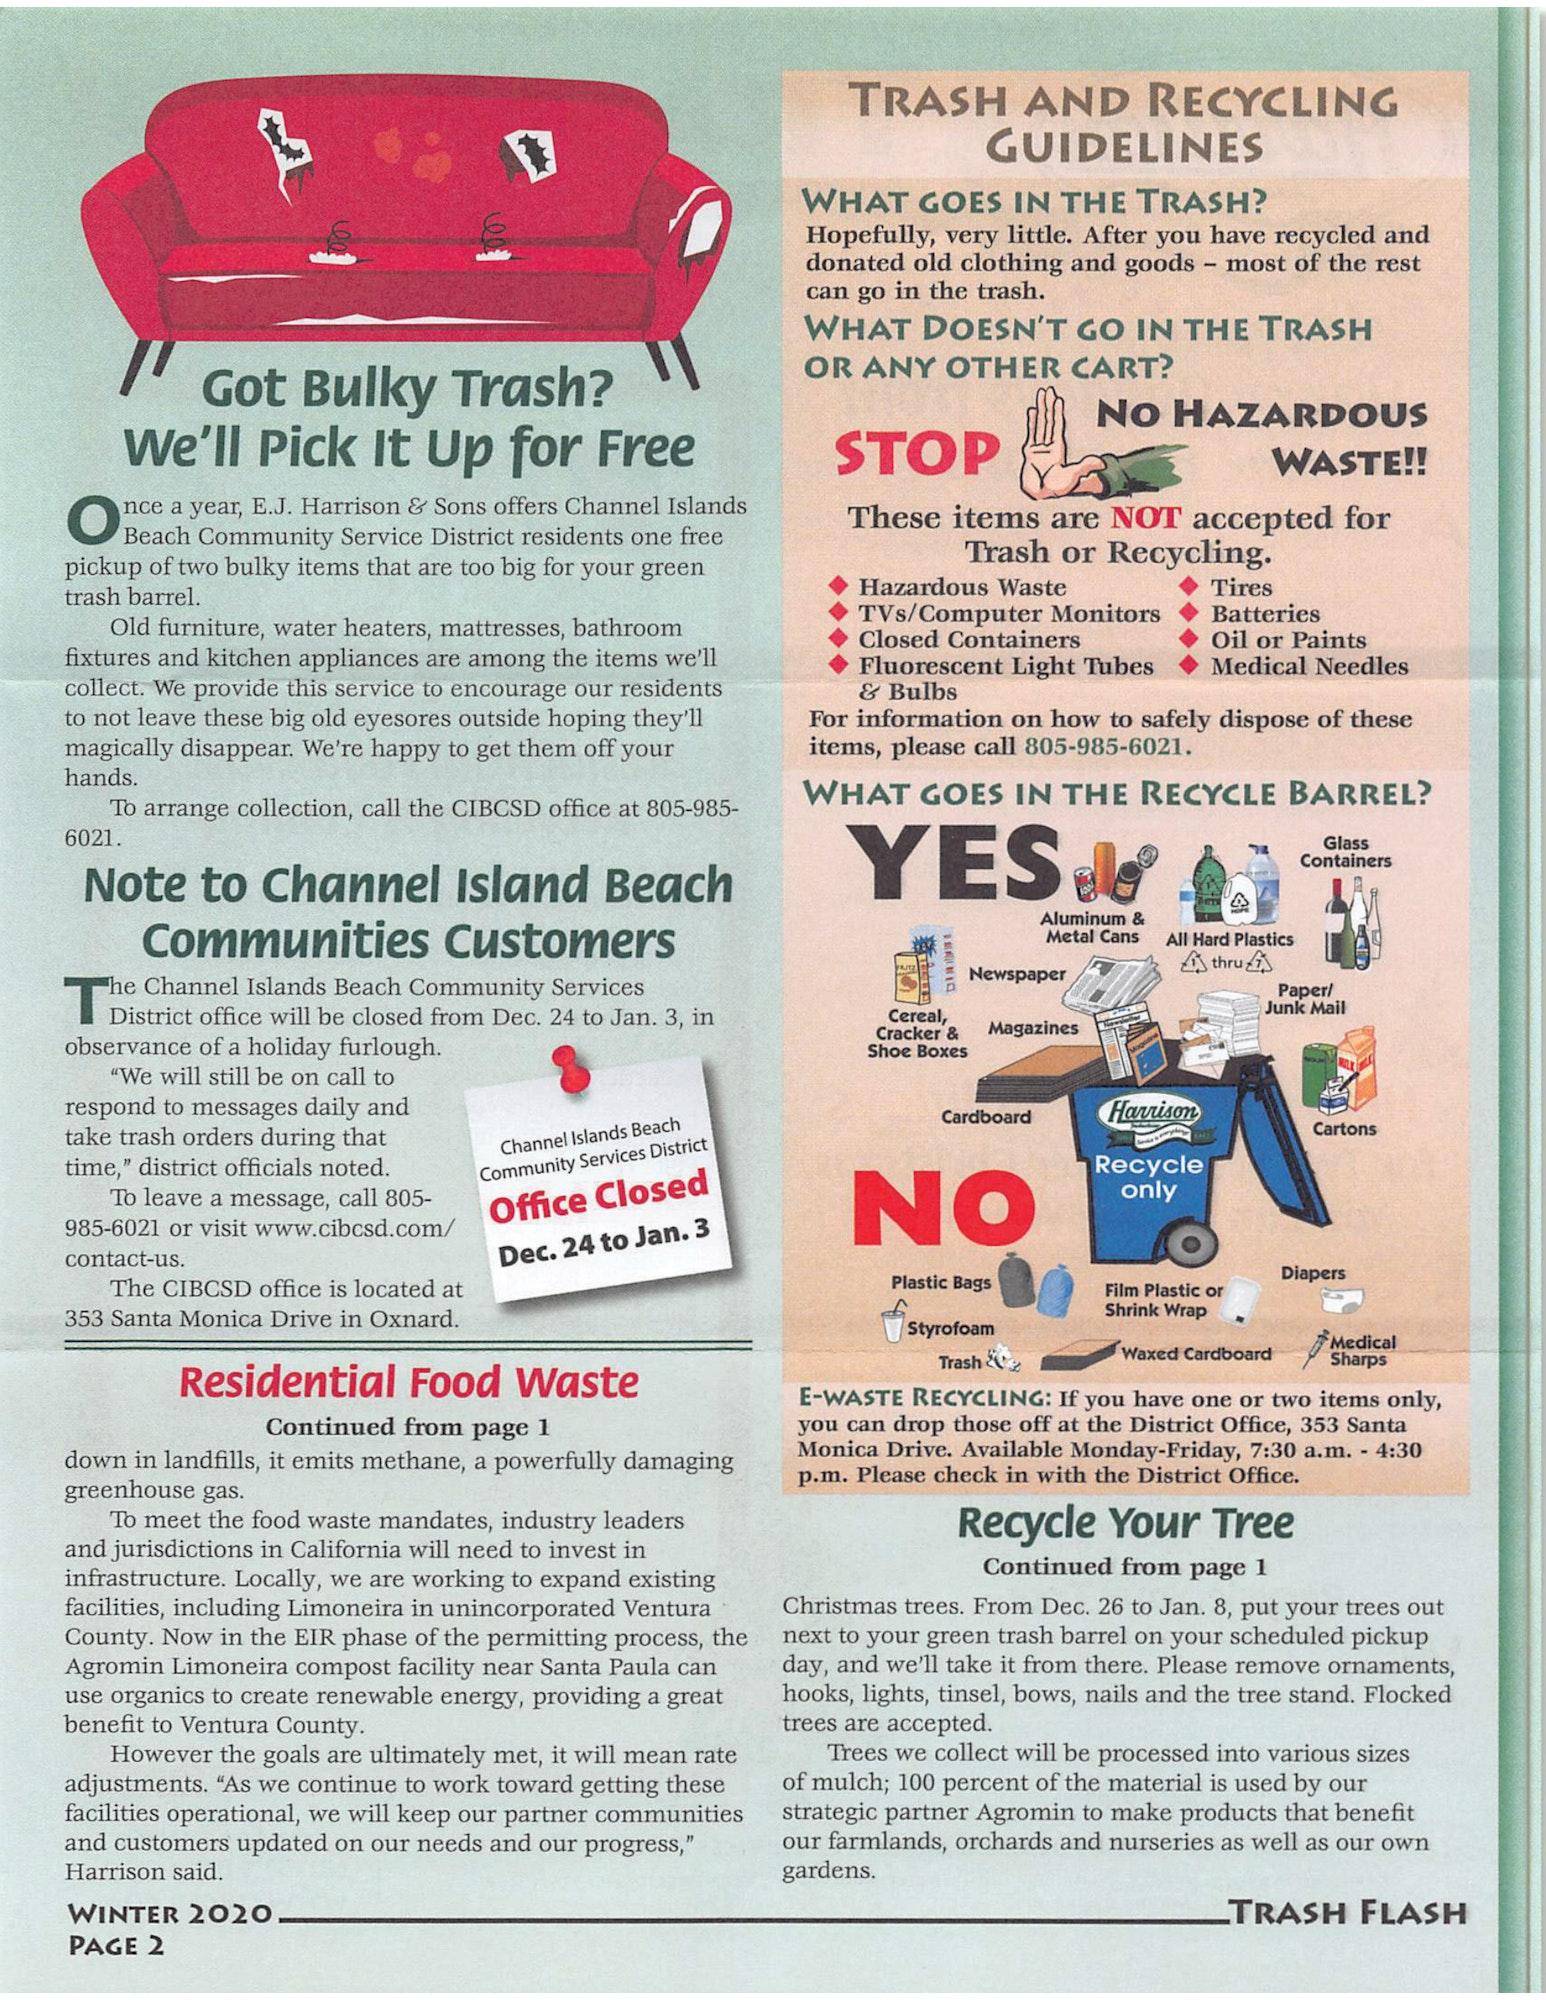 Trash Flash Winter 2020 page 2